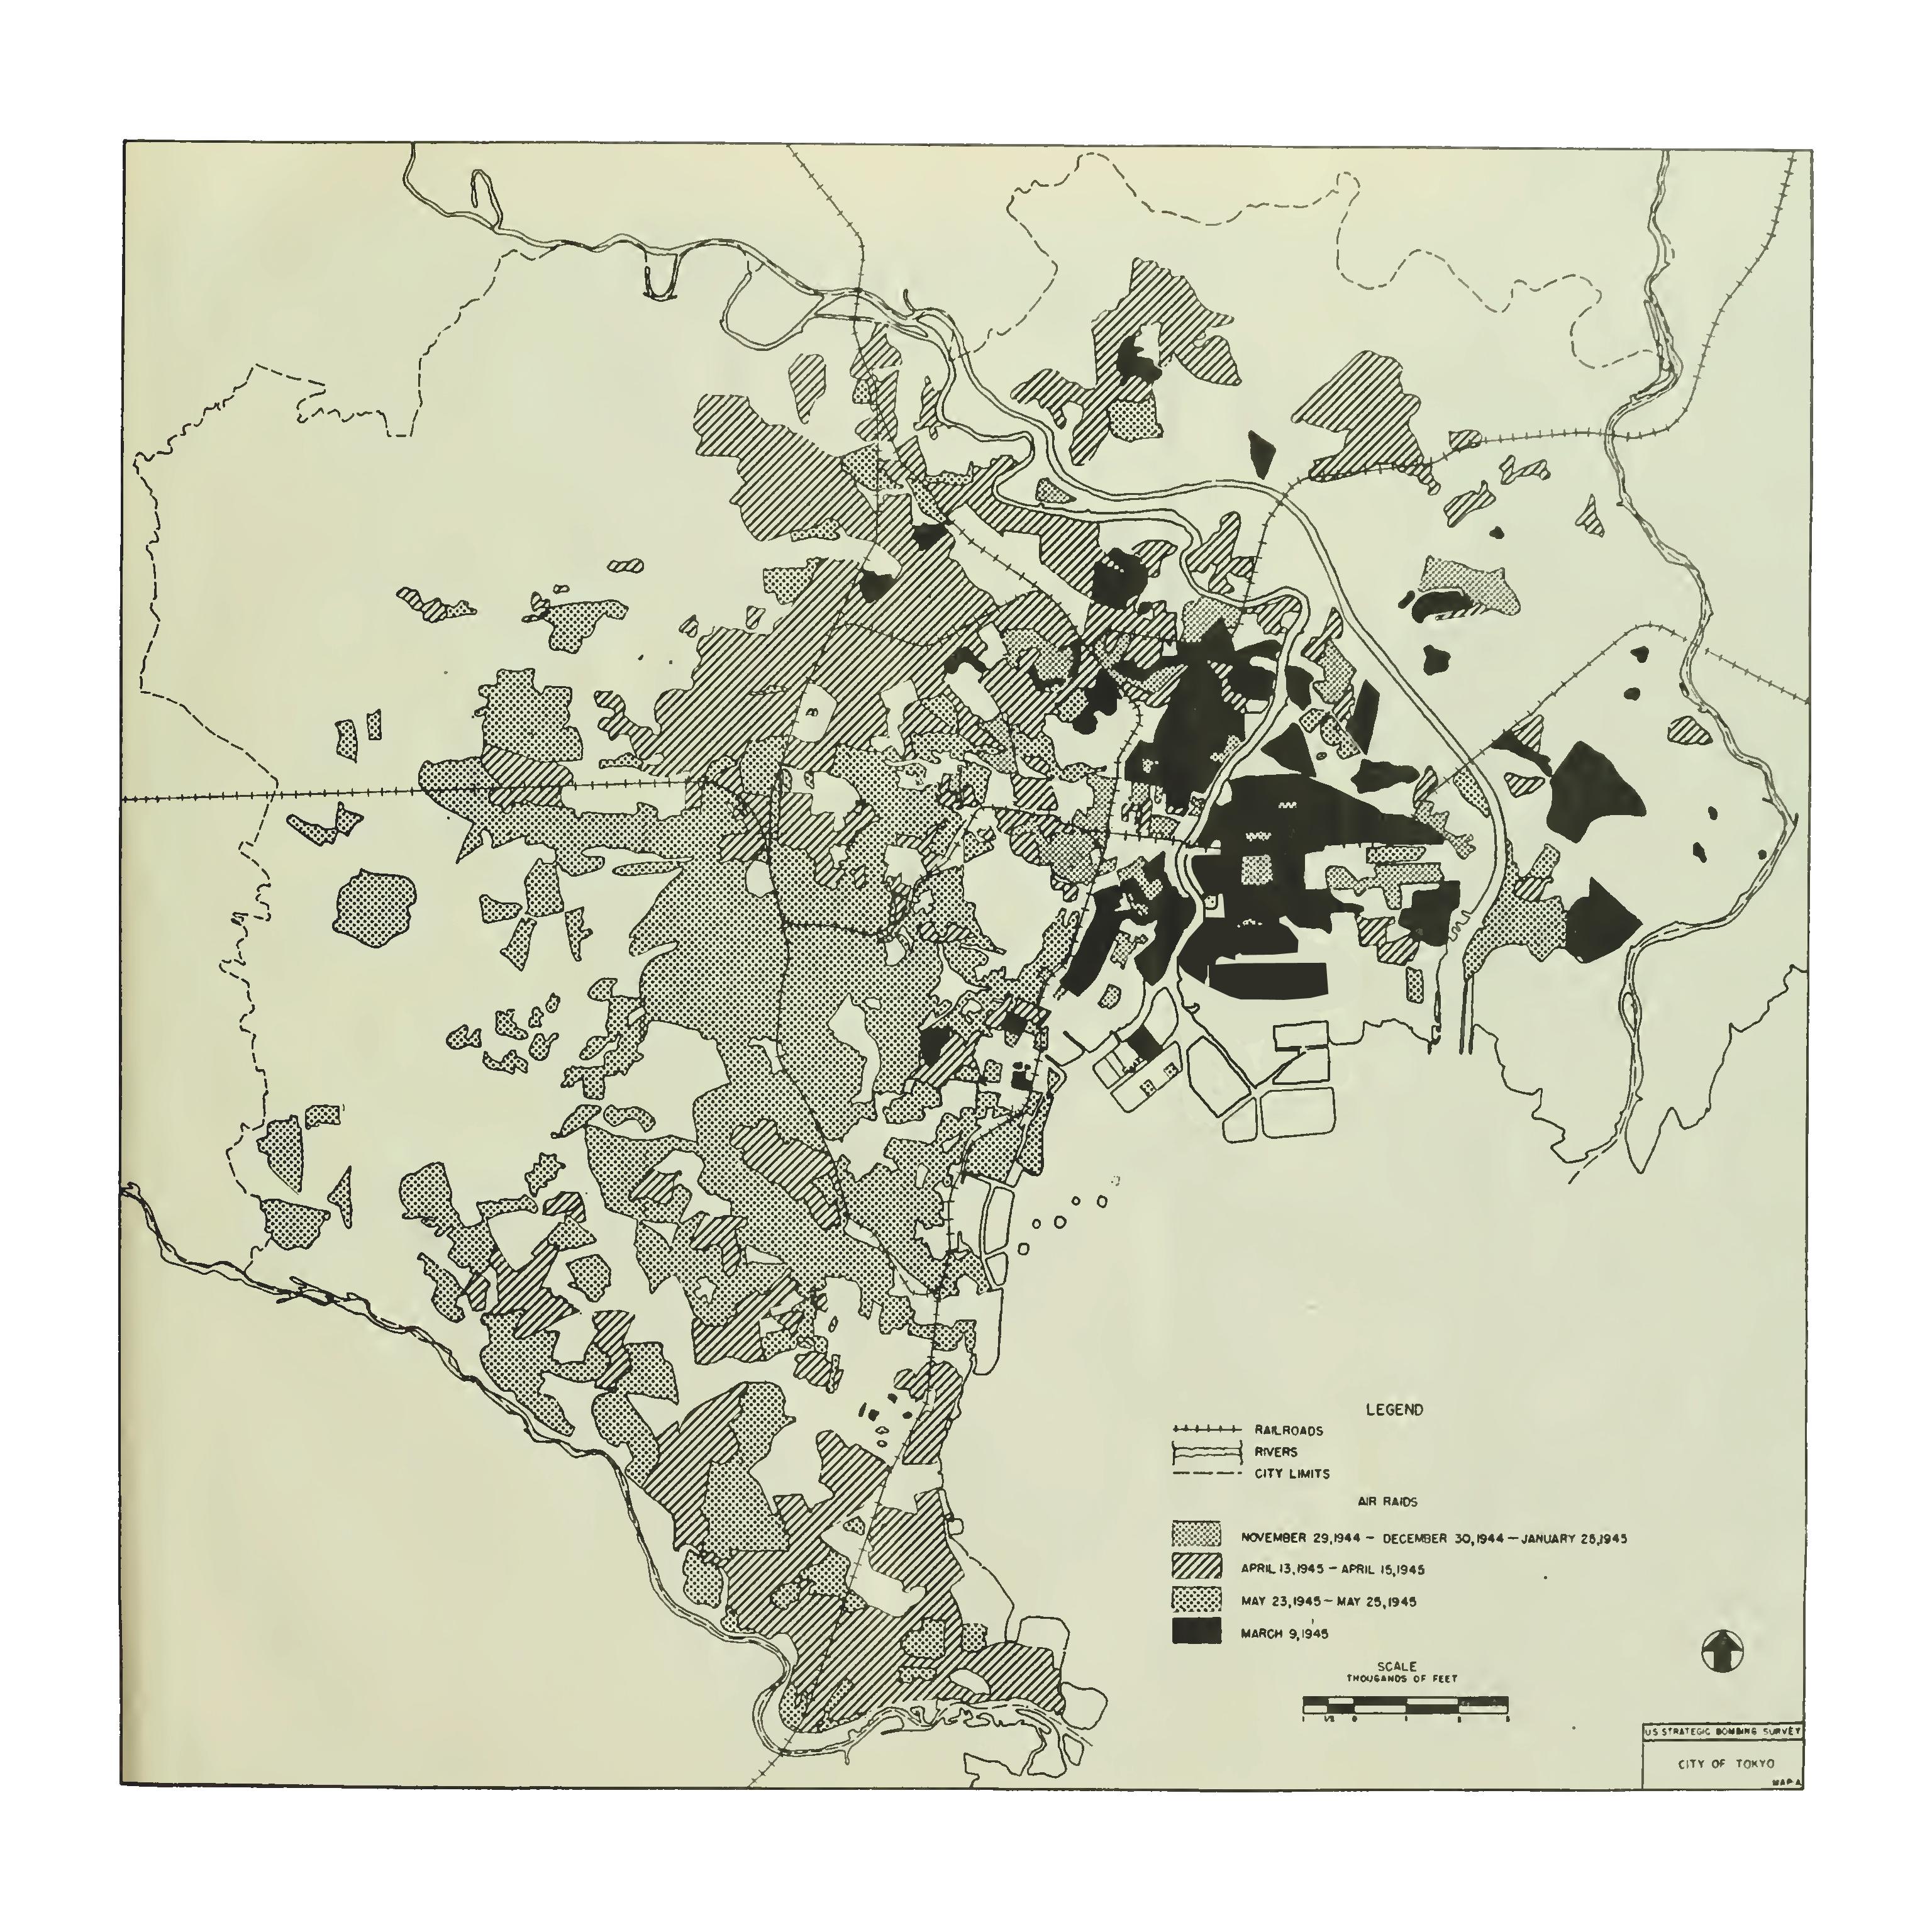 Doolittle Raid Map on